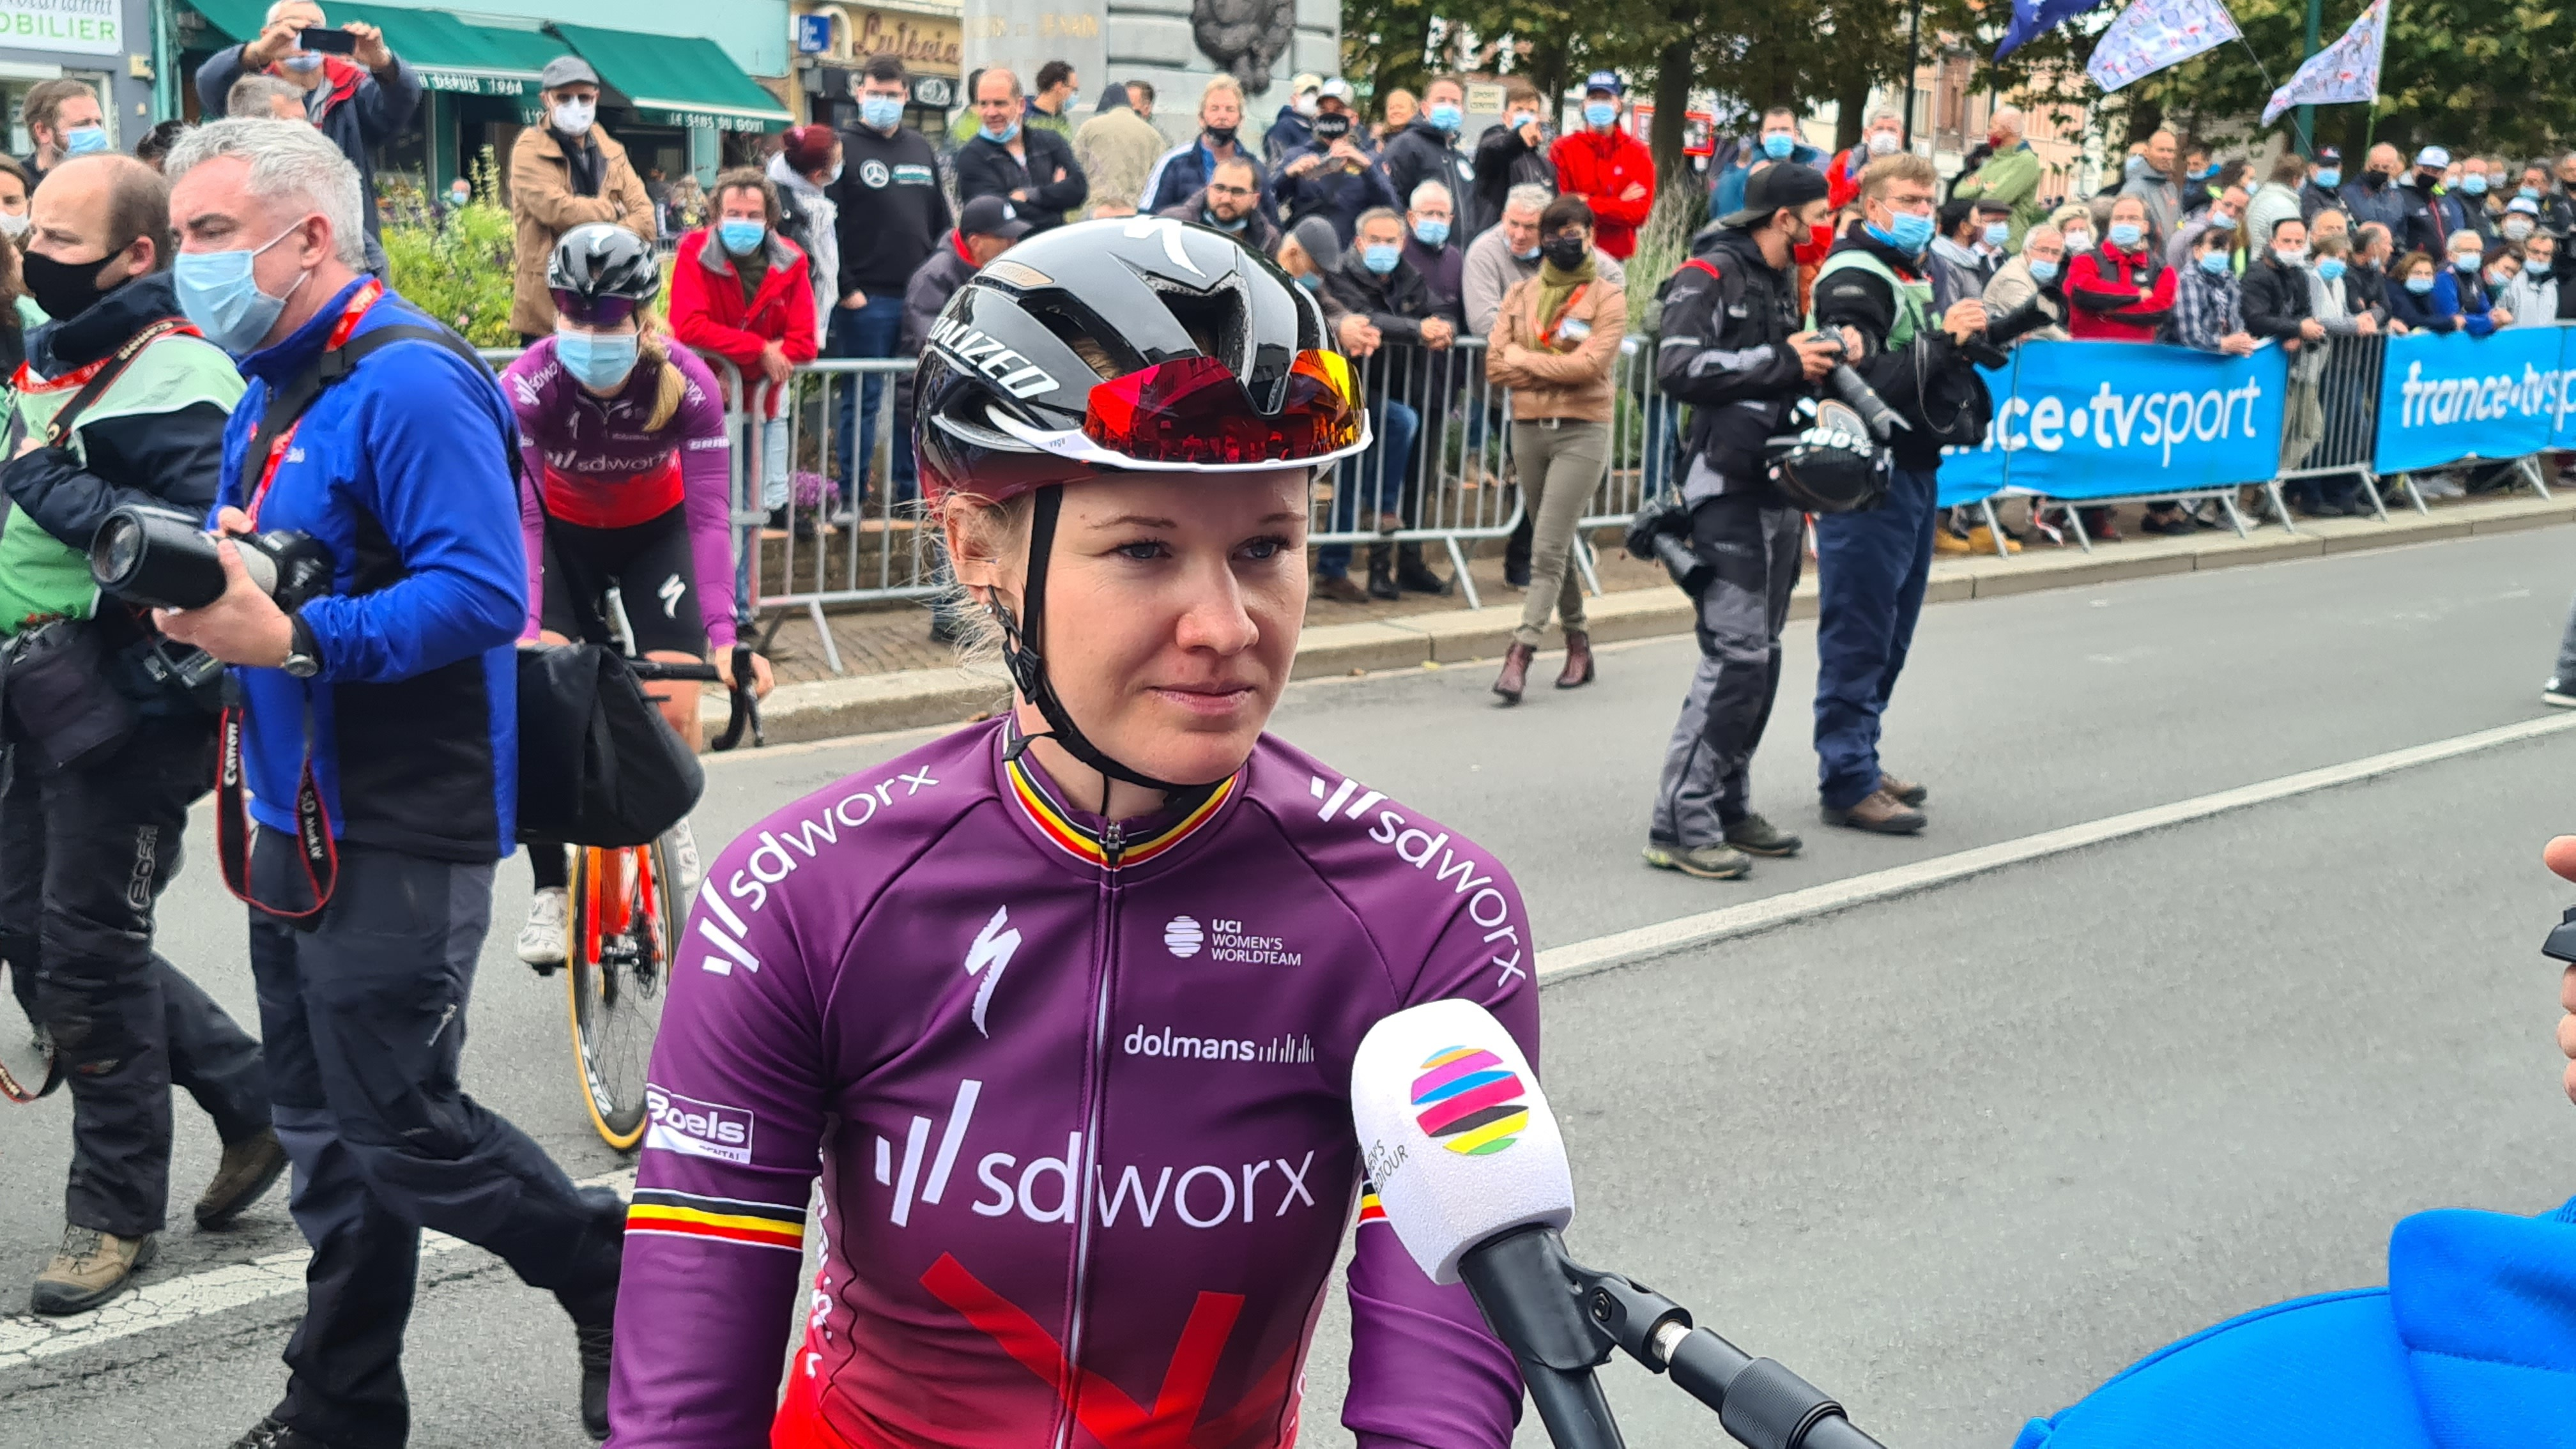 Paris-Roubaix Femmes 2021